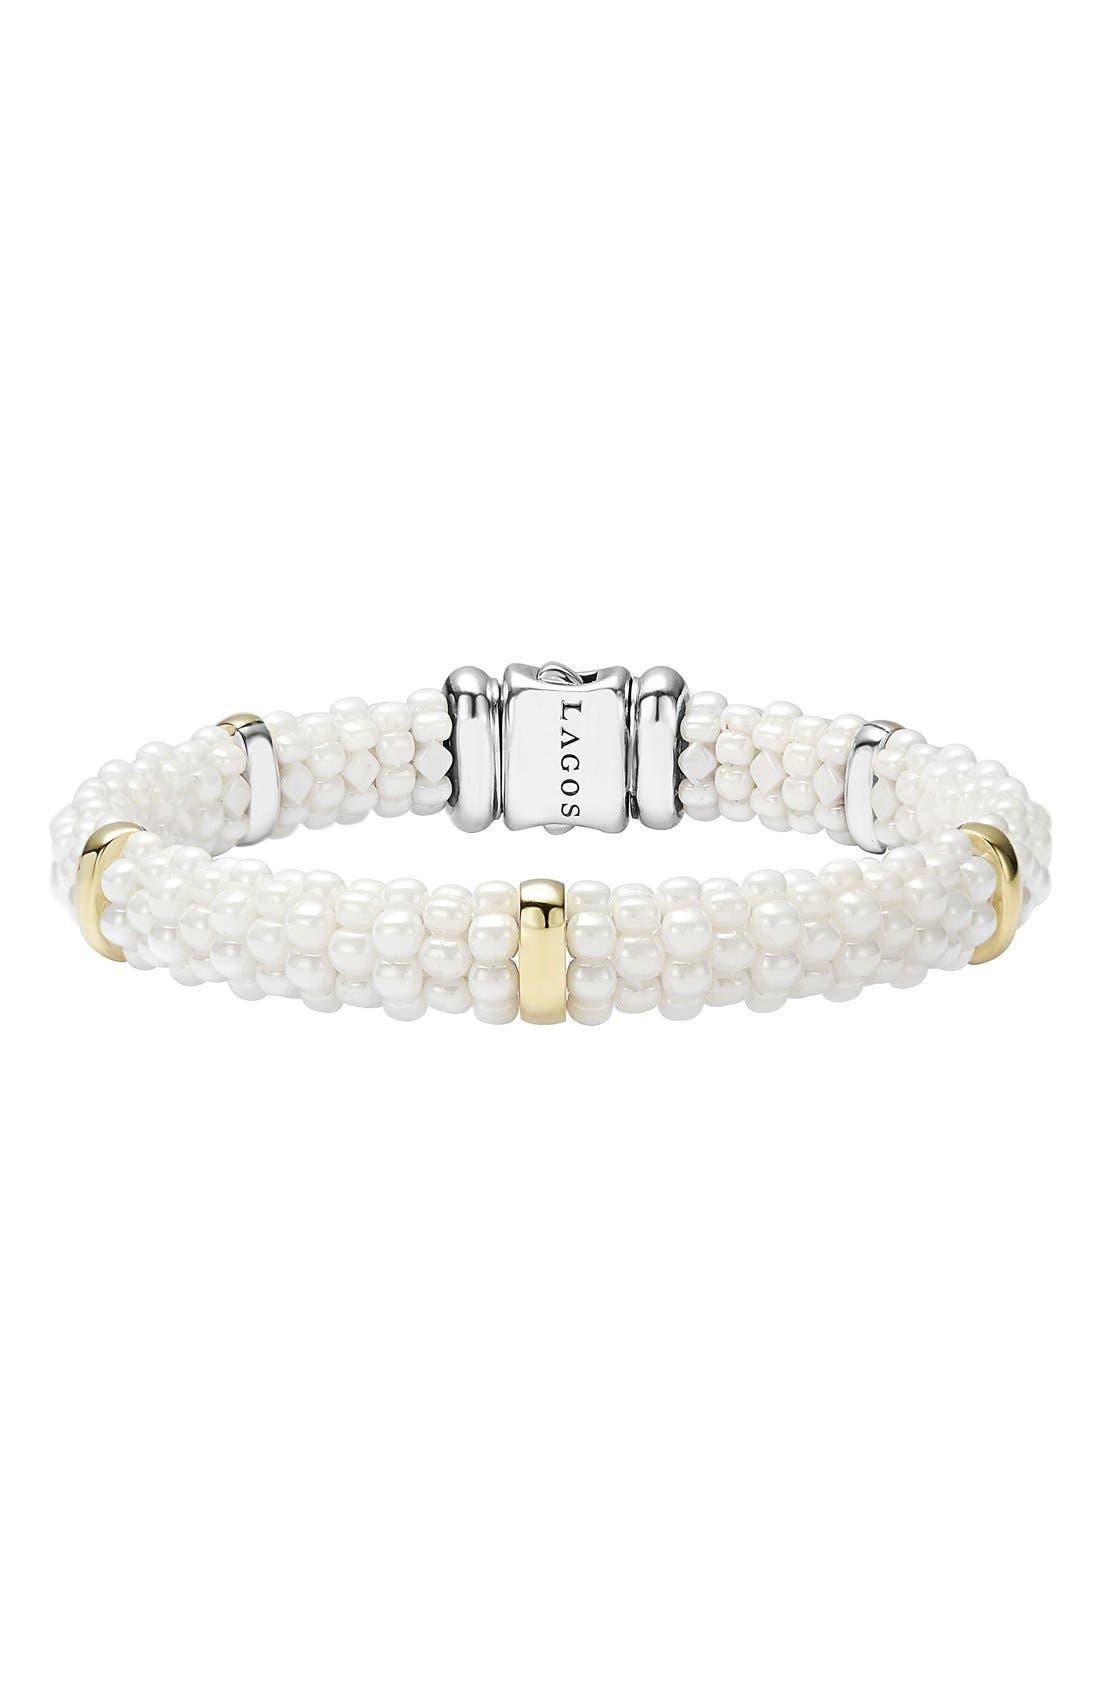 Main Image - LAGOS 'White Caviar' Station Bracelet